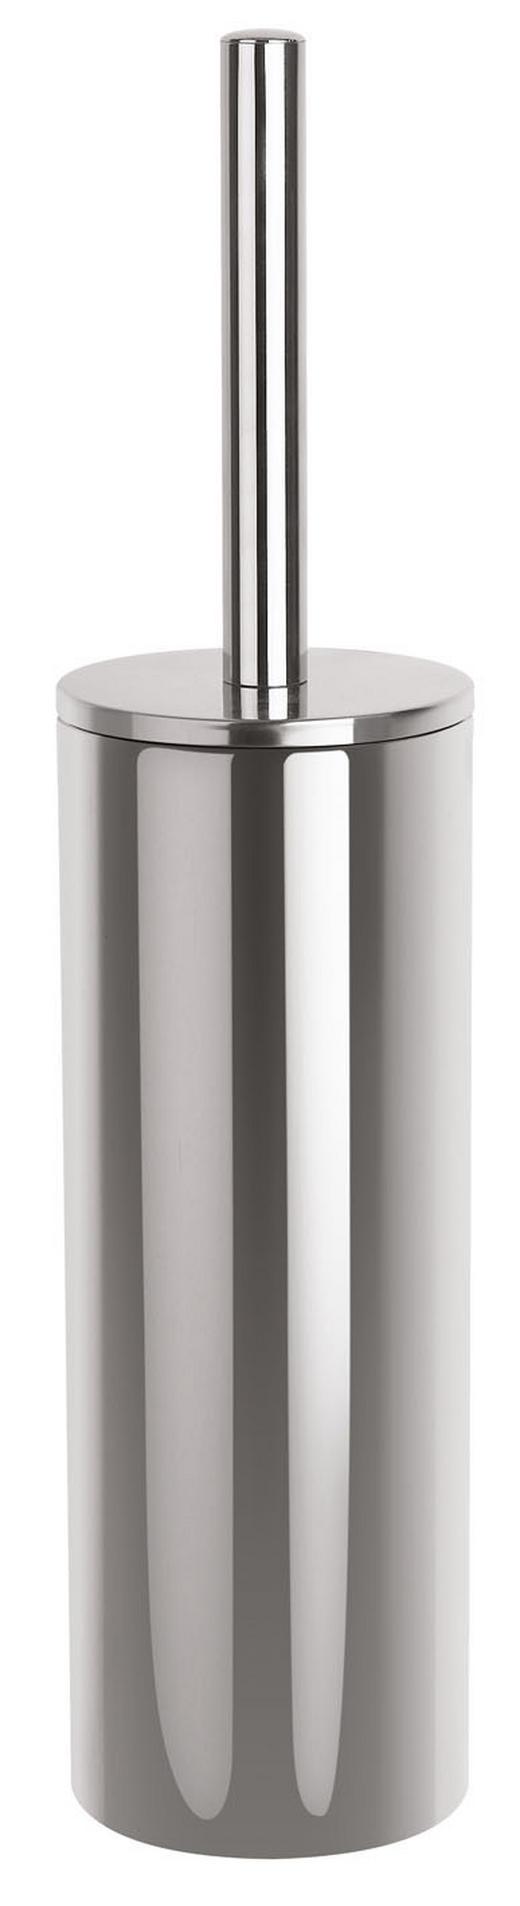 WC-BÜRSTENGARNITUR - Edelstahlfarben, Basics, Kunststoff/Metall (9.5/40cm) - SPIRELLA